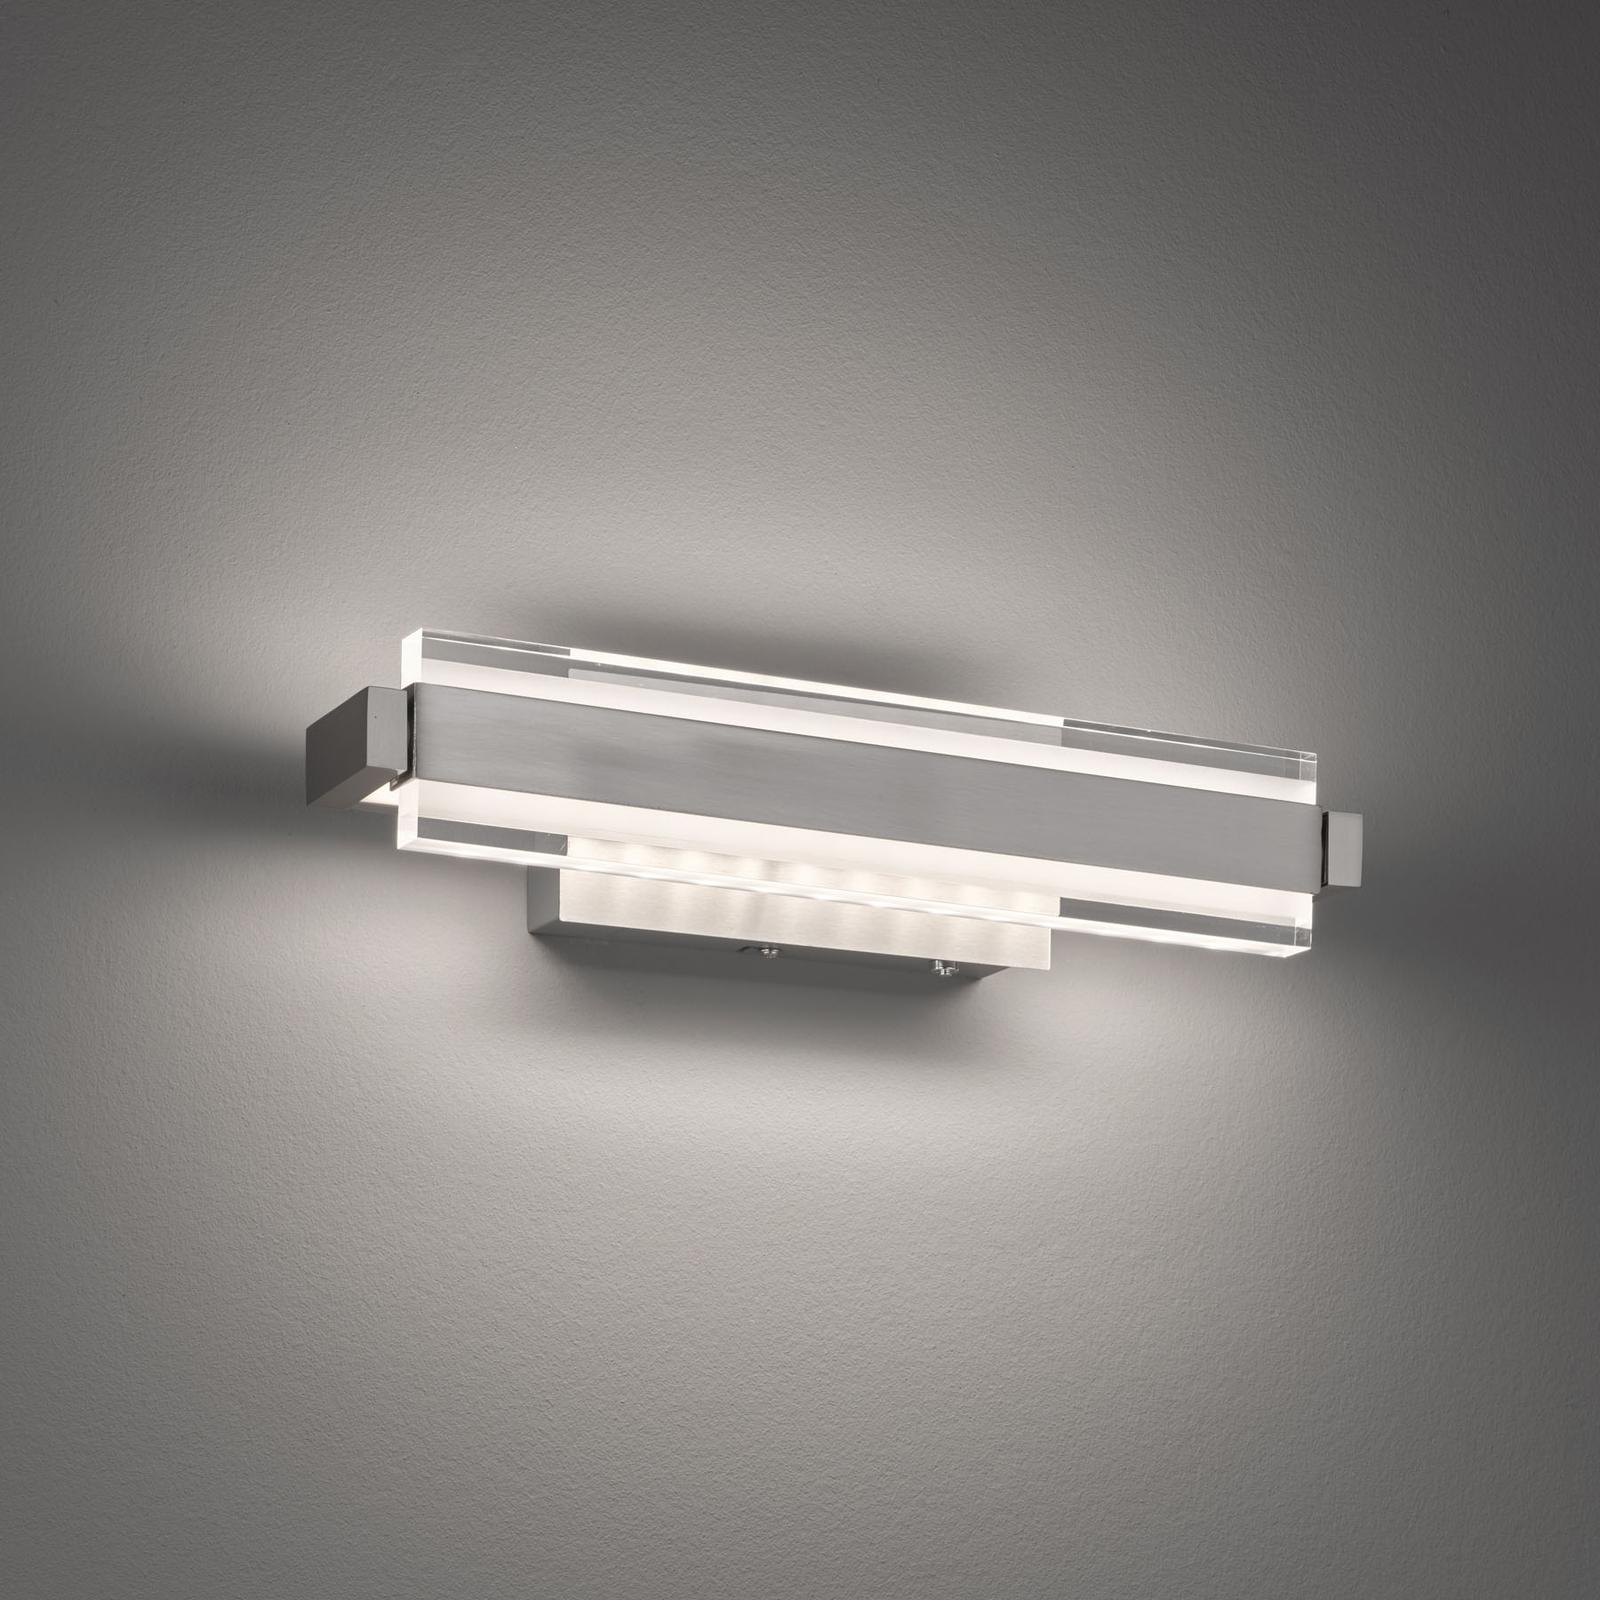 LED-Wandleuchte Z-Paros ZigBee Fernbedienung Touch